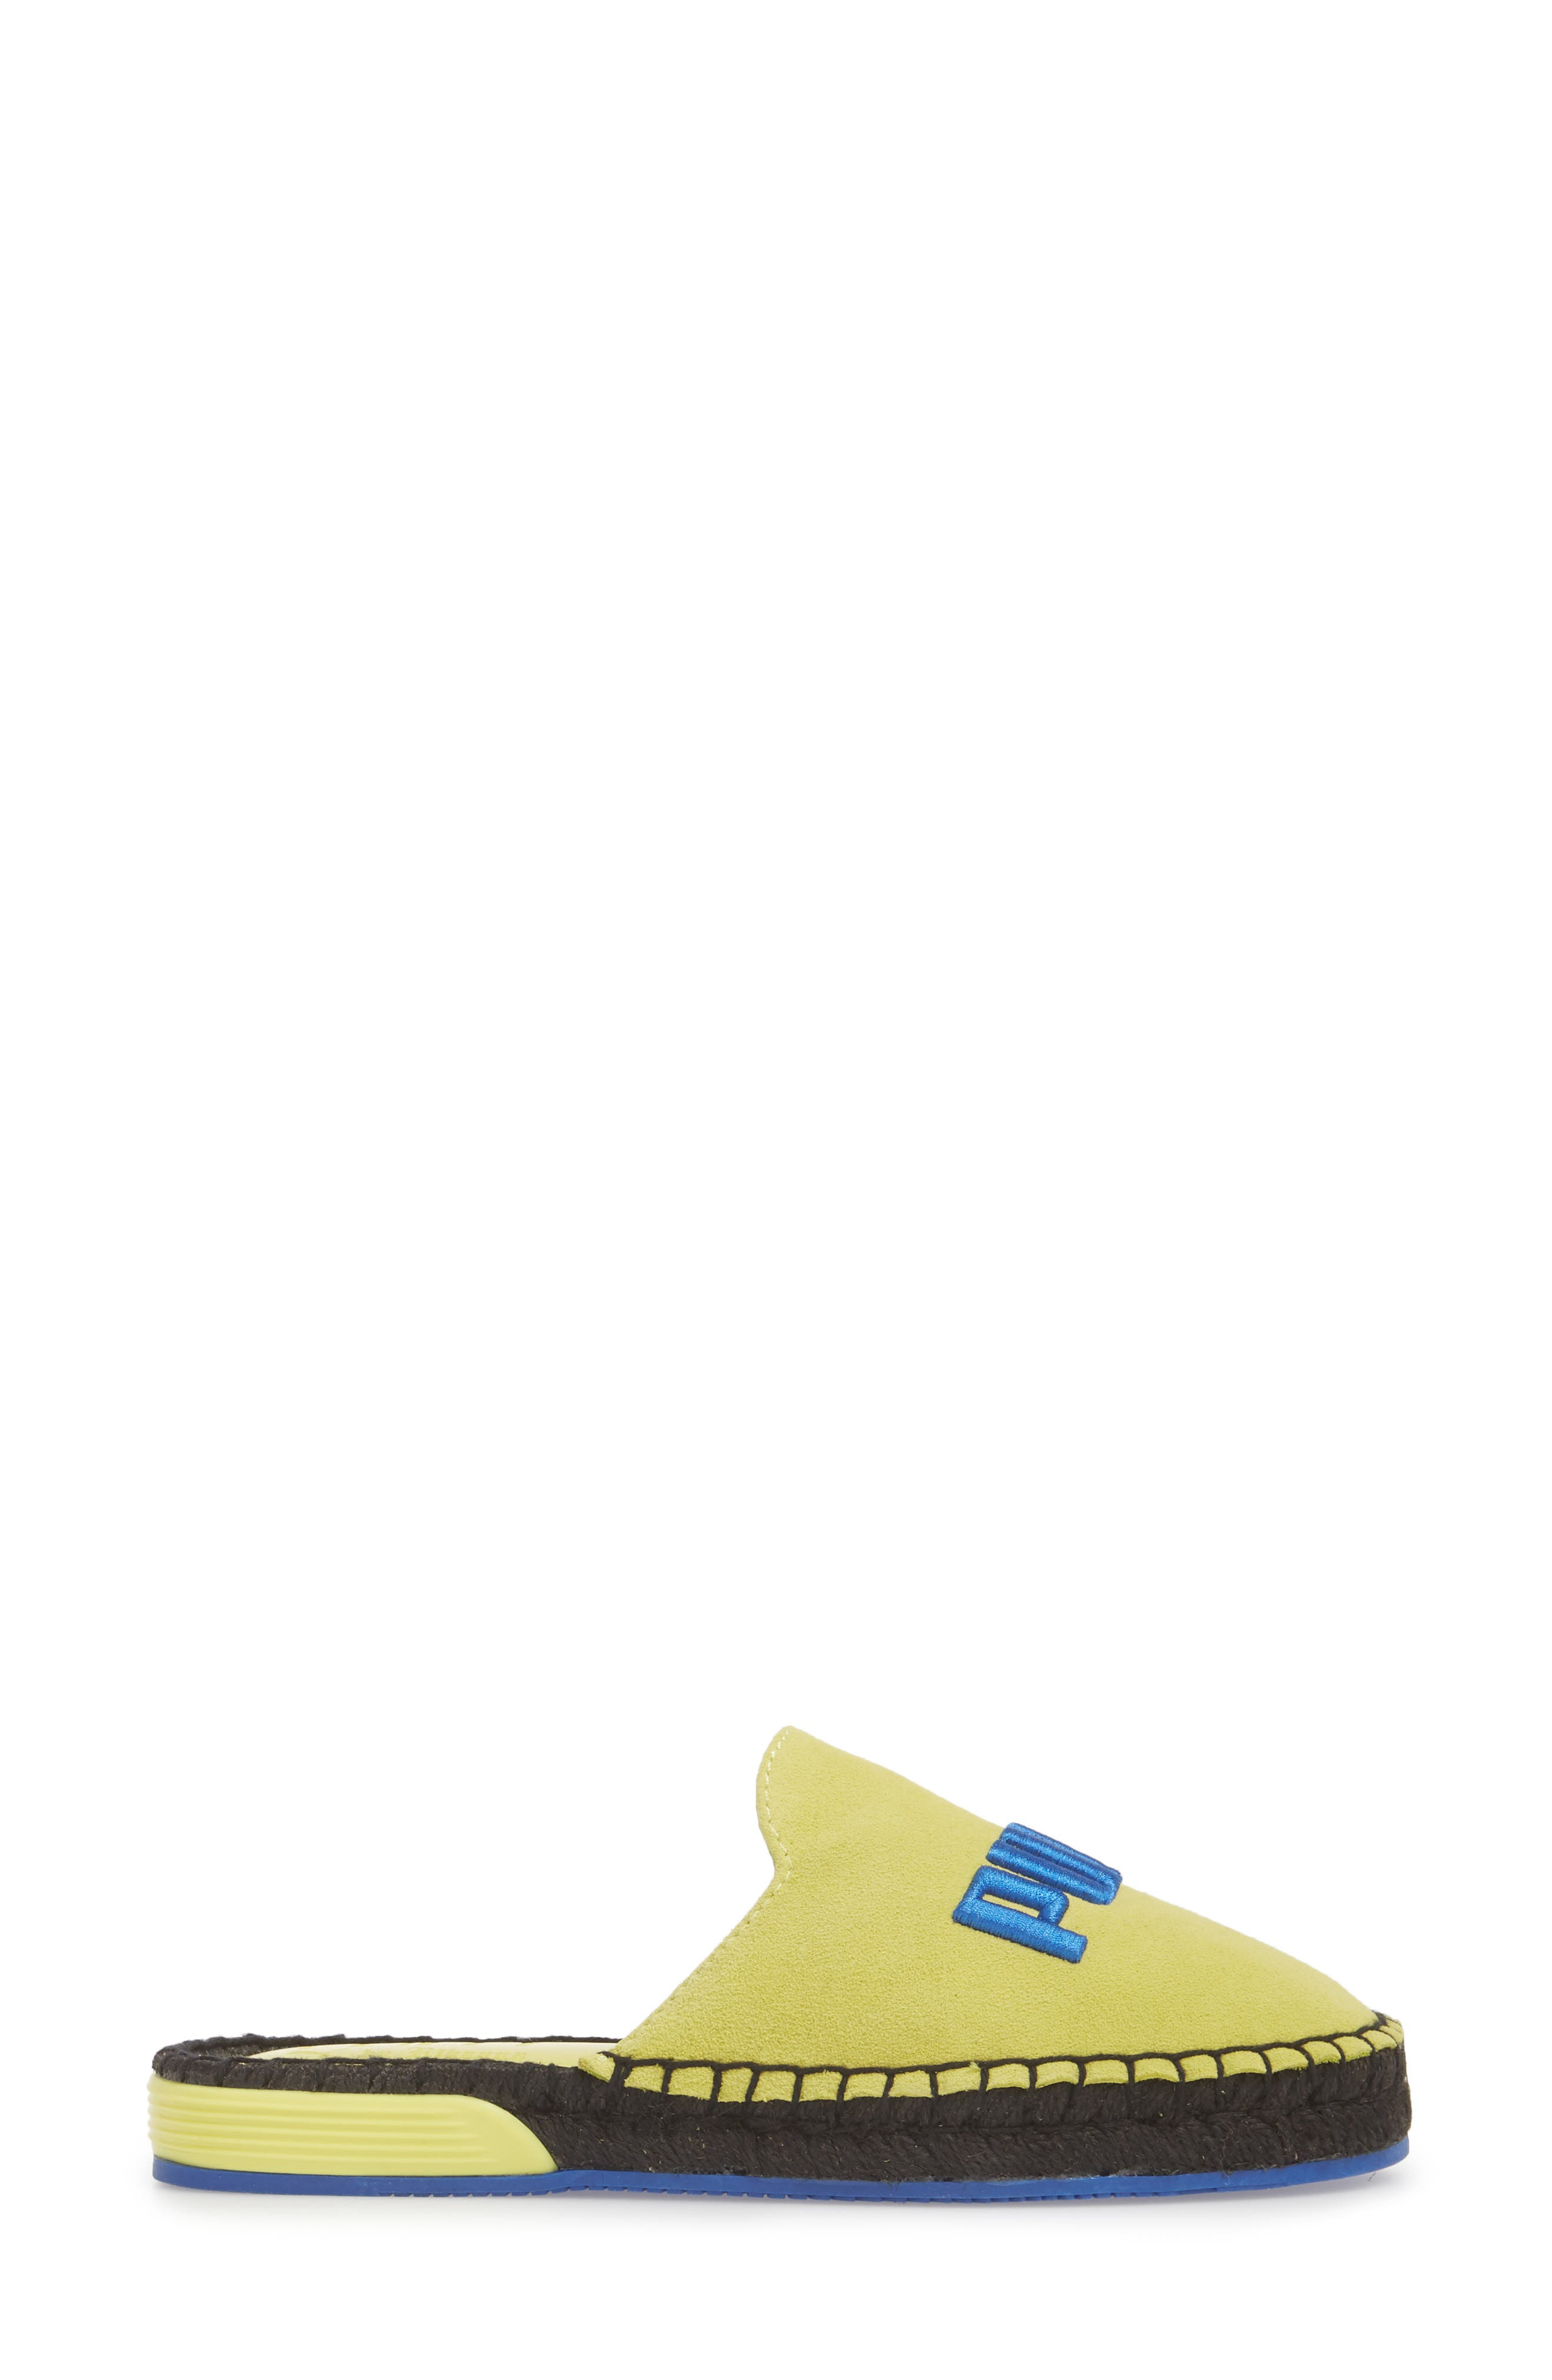 FENTY PUMA by Rihanna Espadrille Flat,                             Alternate thumbnail 3, color,                             Sulphur Spring/ Dazzling Blue